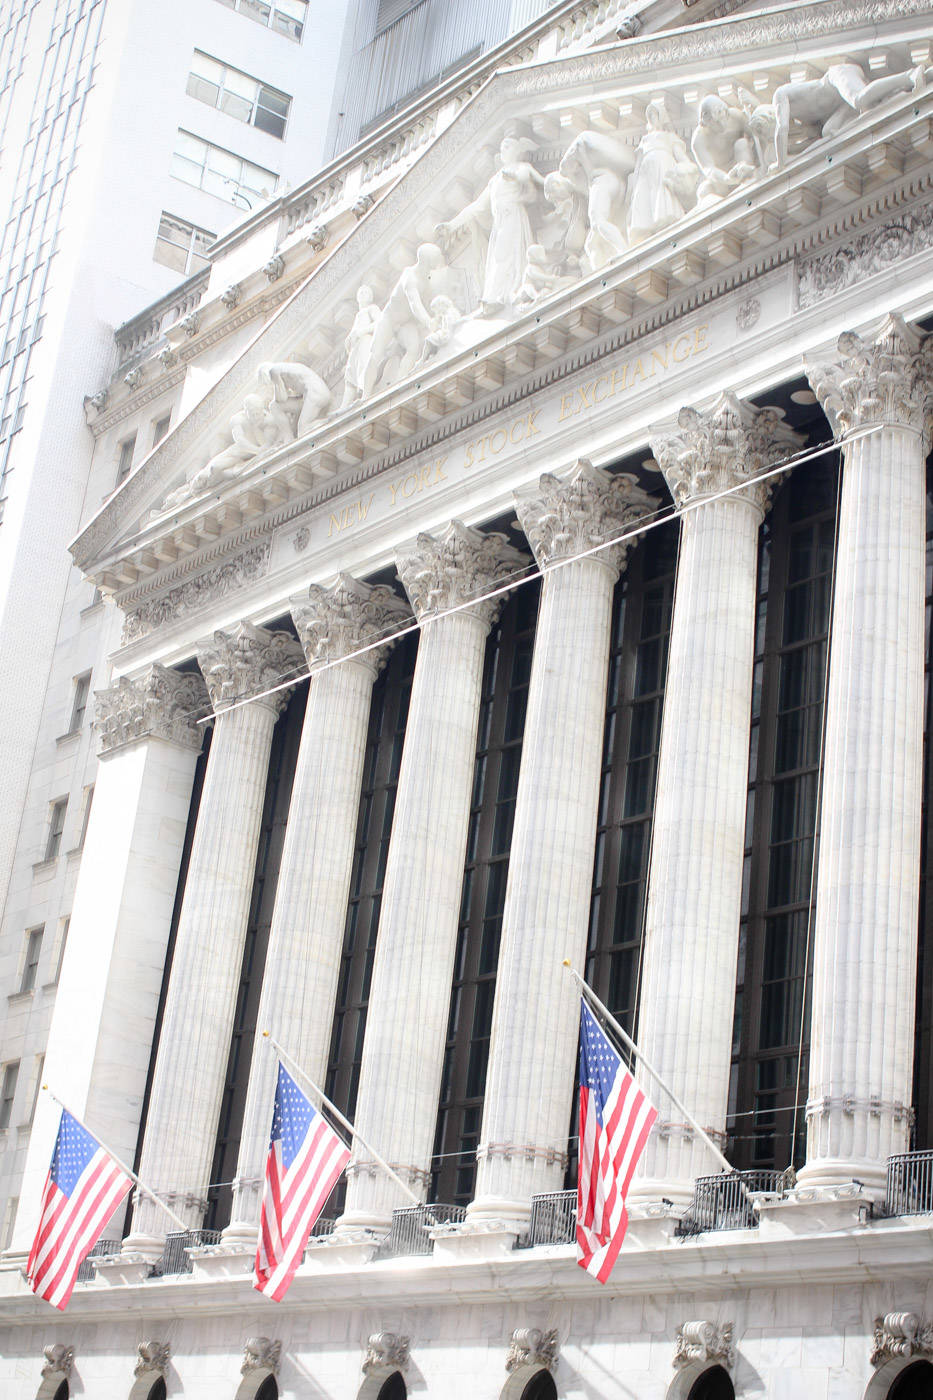 financial district new york stock exchange